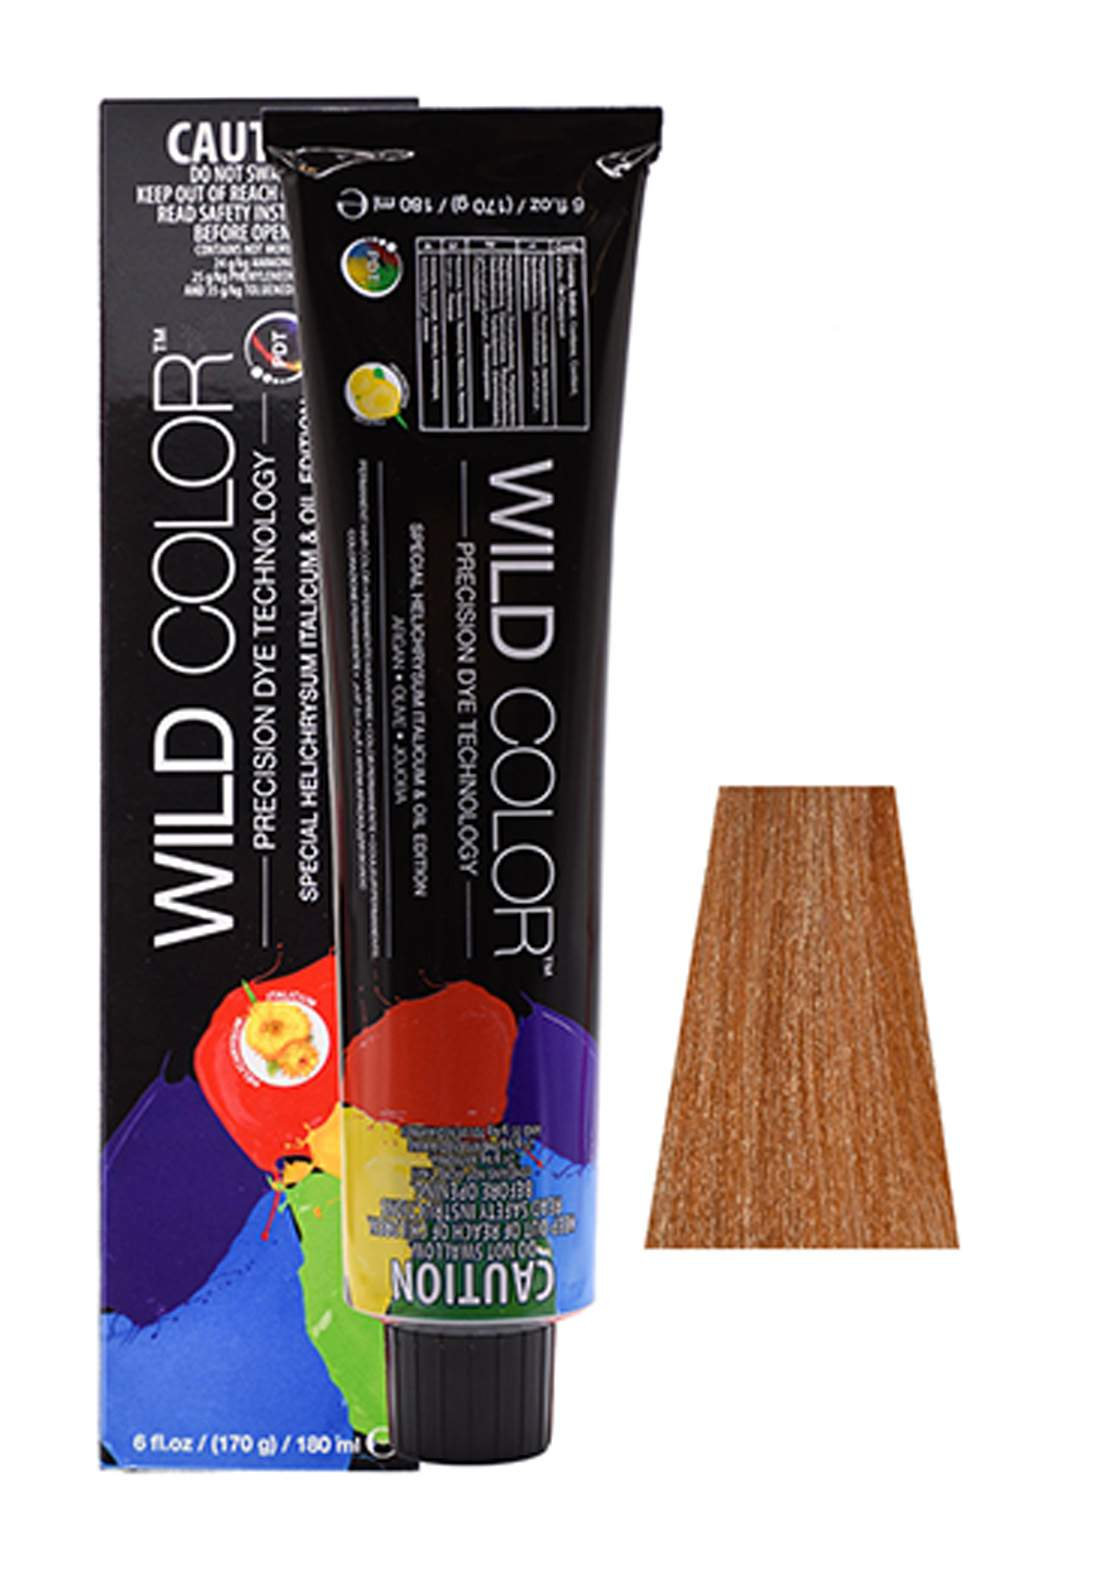 Wild Color Hair Color Cream 9.34 9GC -Very Light Gold Copper Blond صبغة شعر